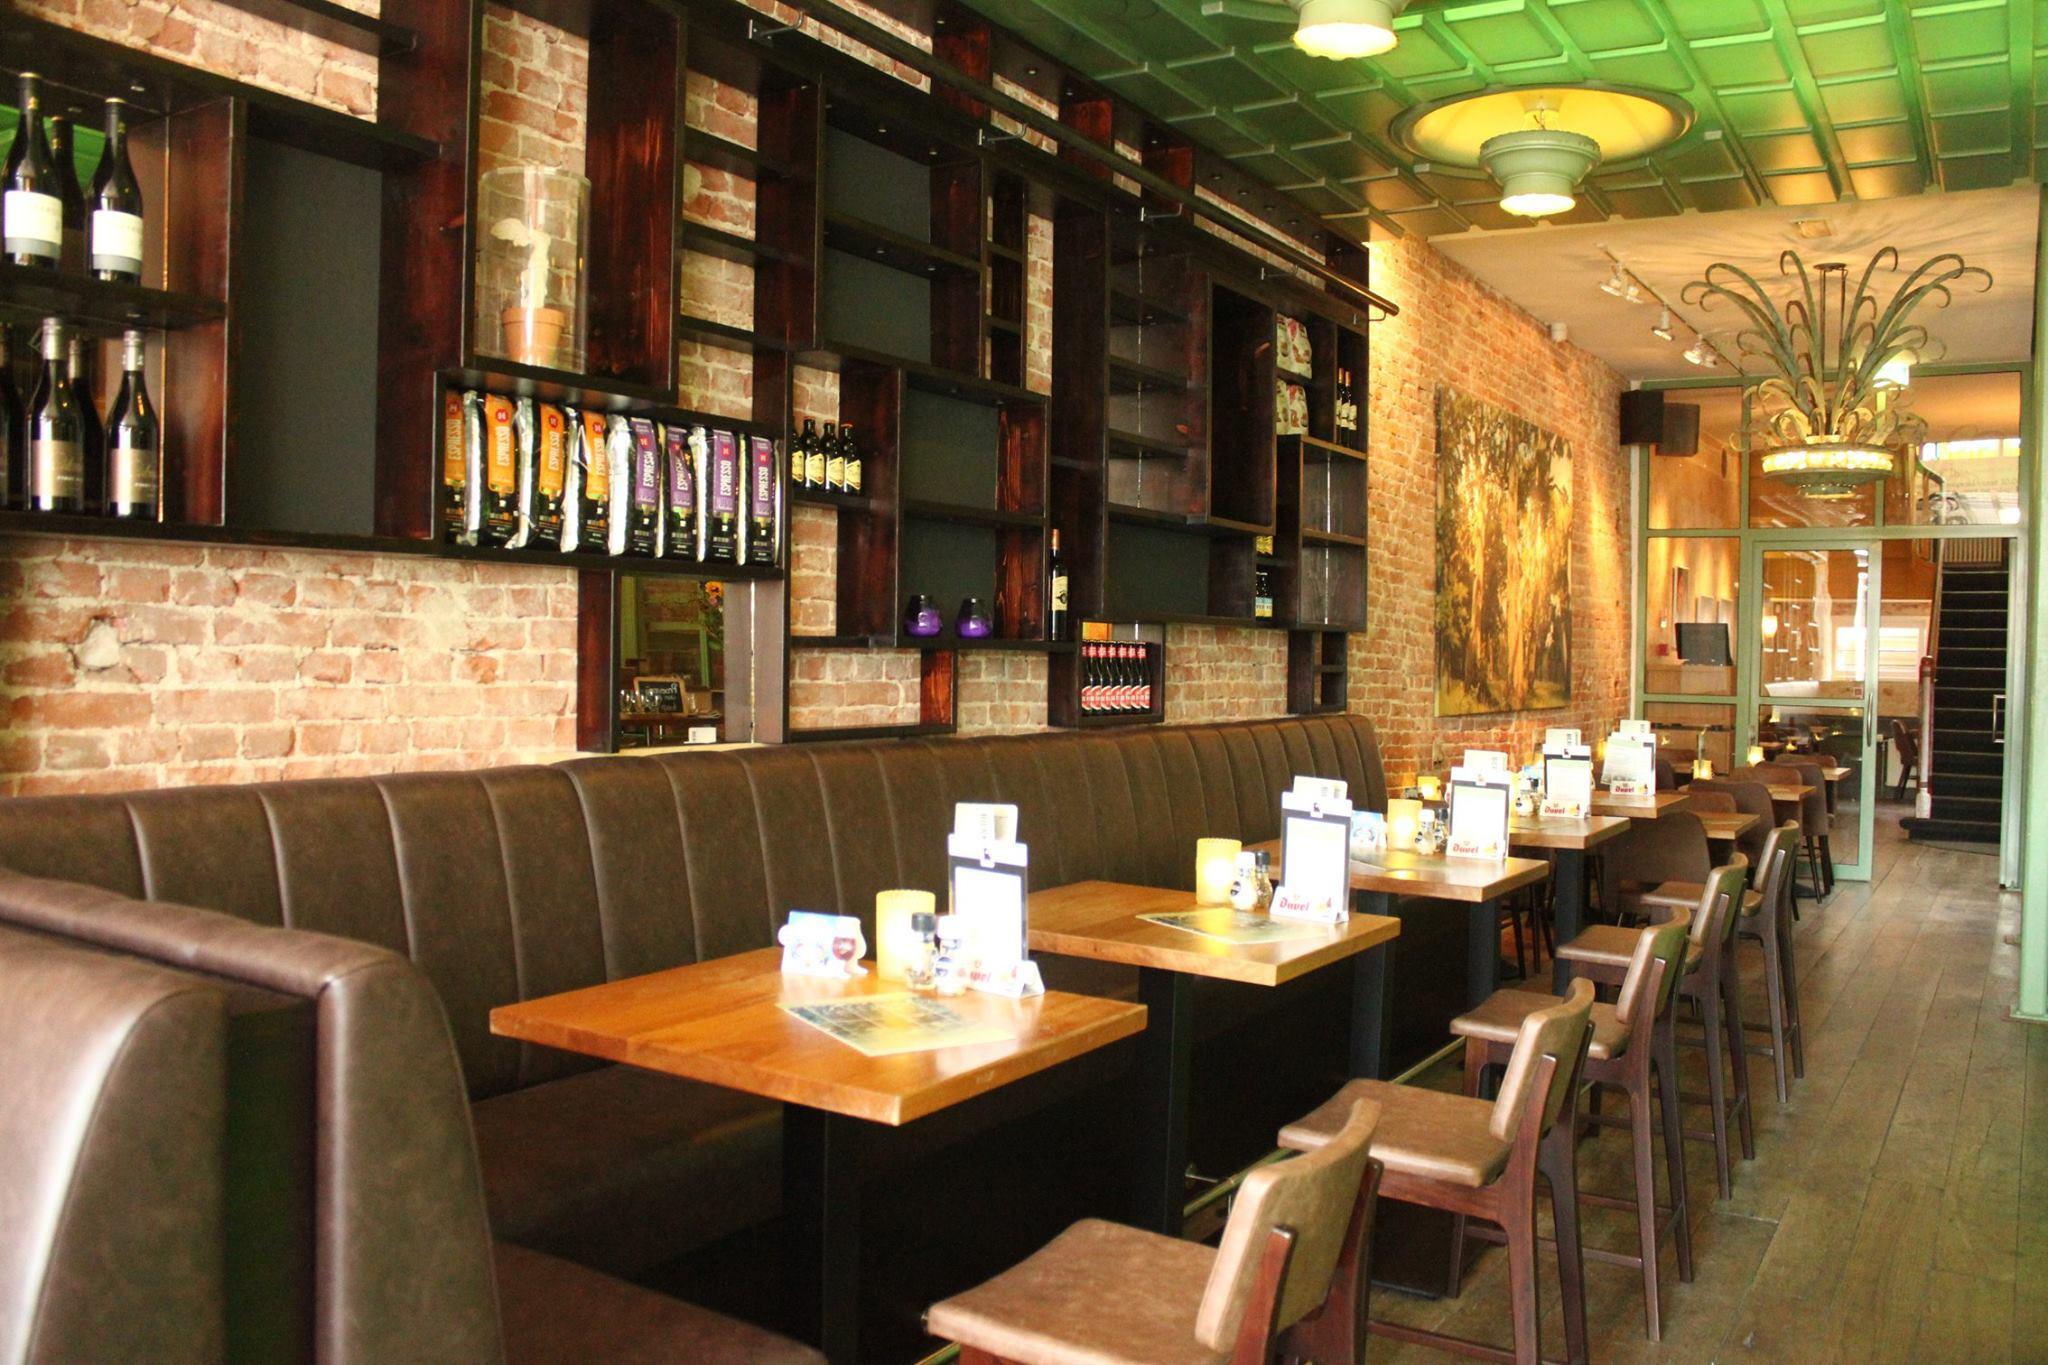 Grandcafé & Restaurant Hemels